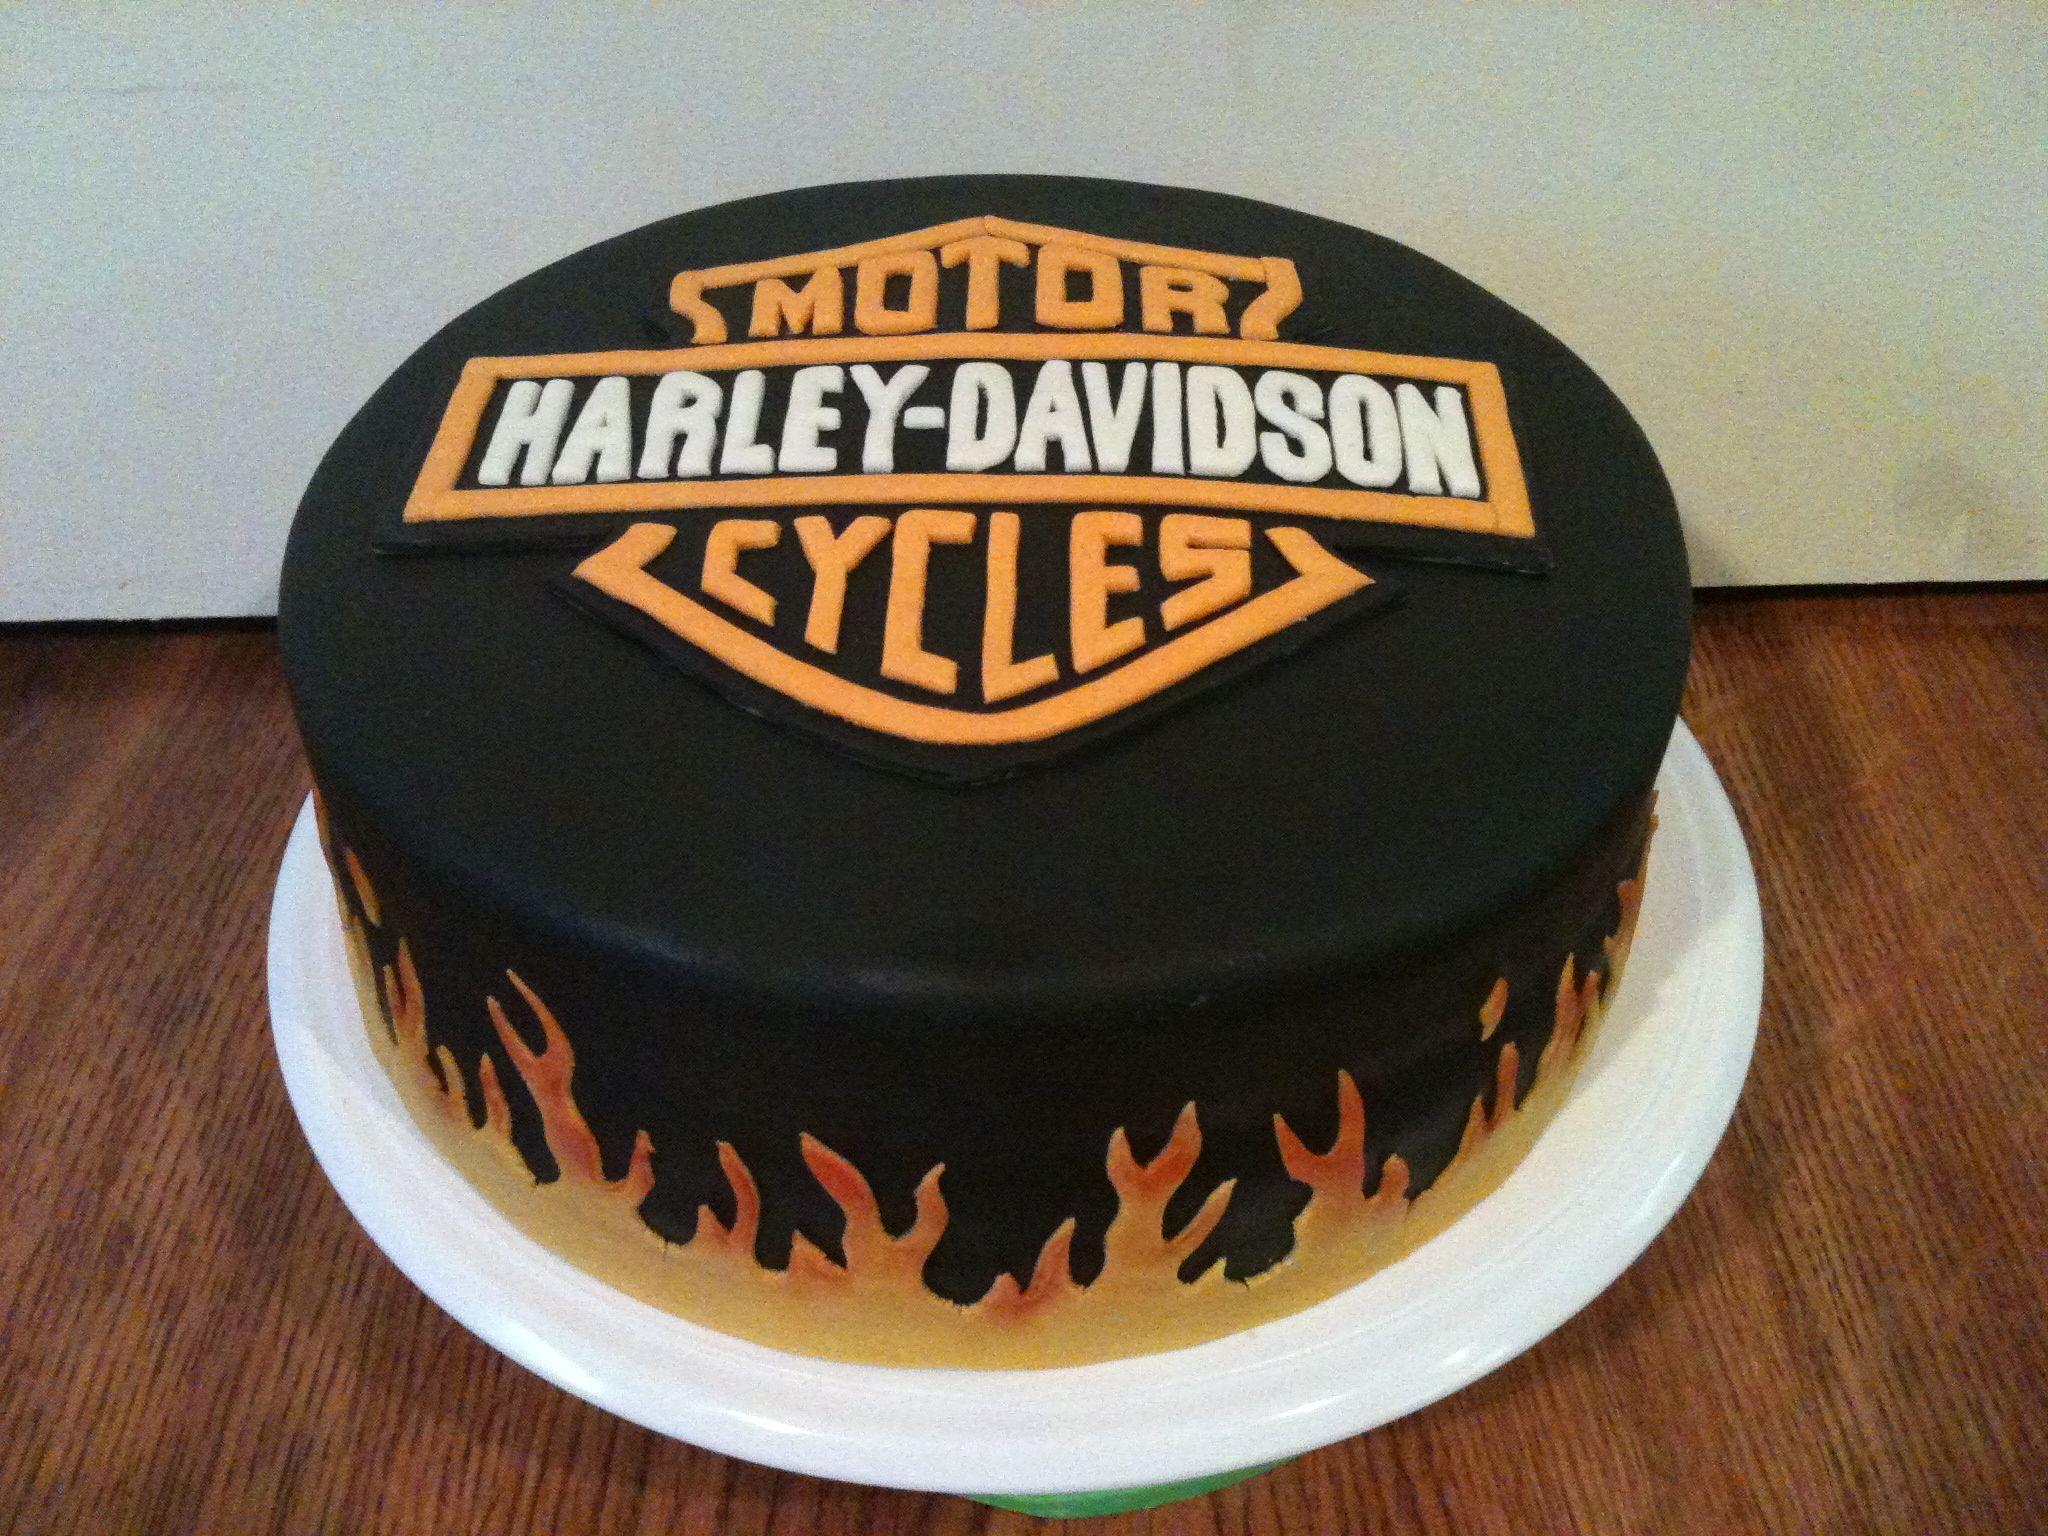 Harley Davidson Cake With Images Harley Davidson Cake Fondant